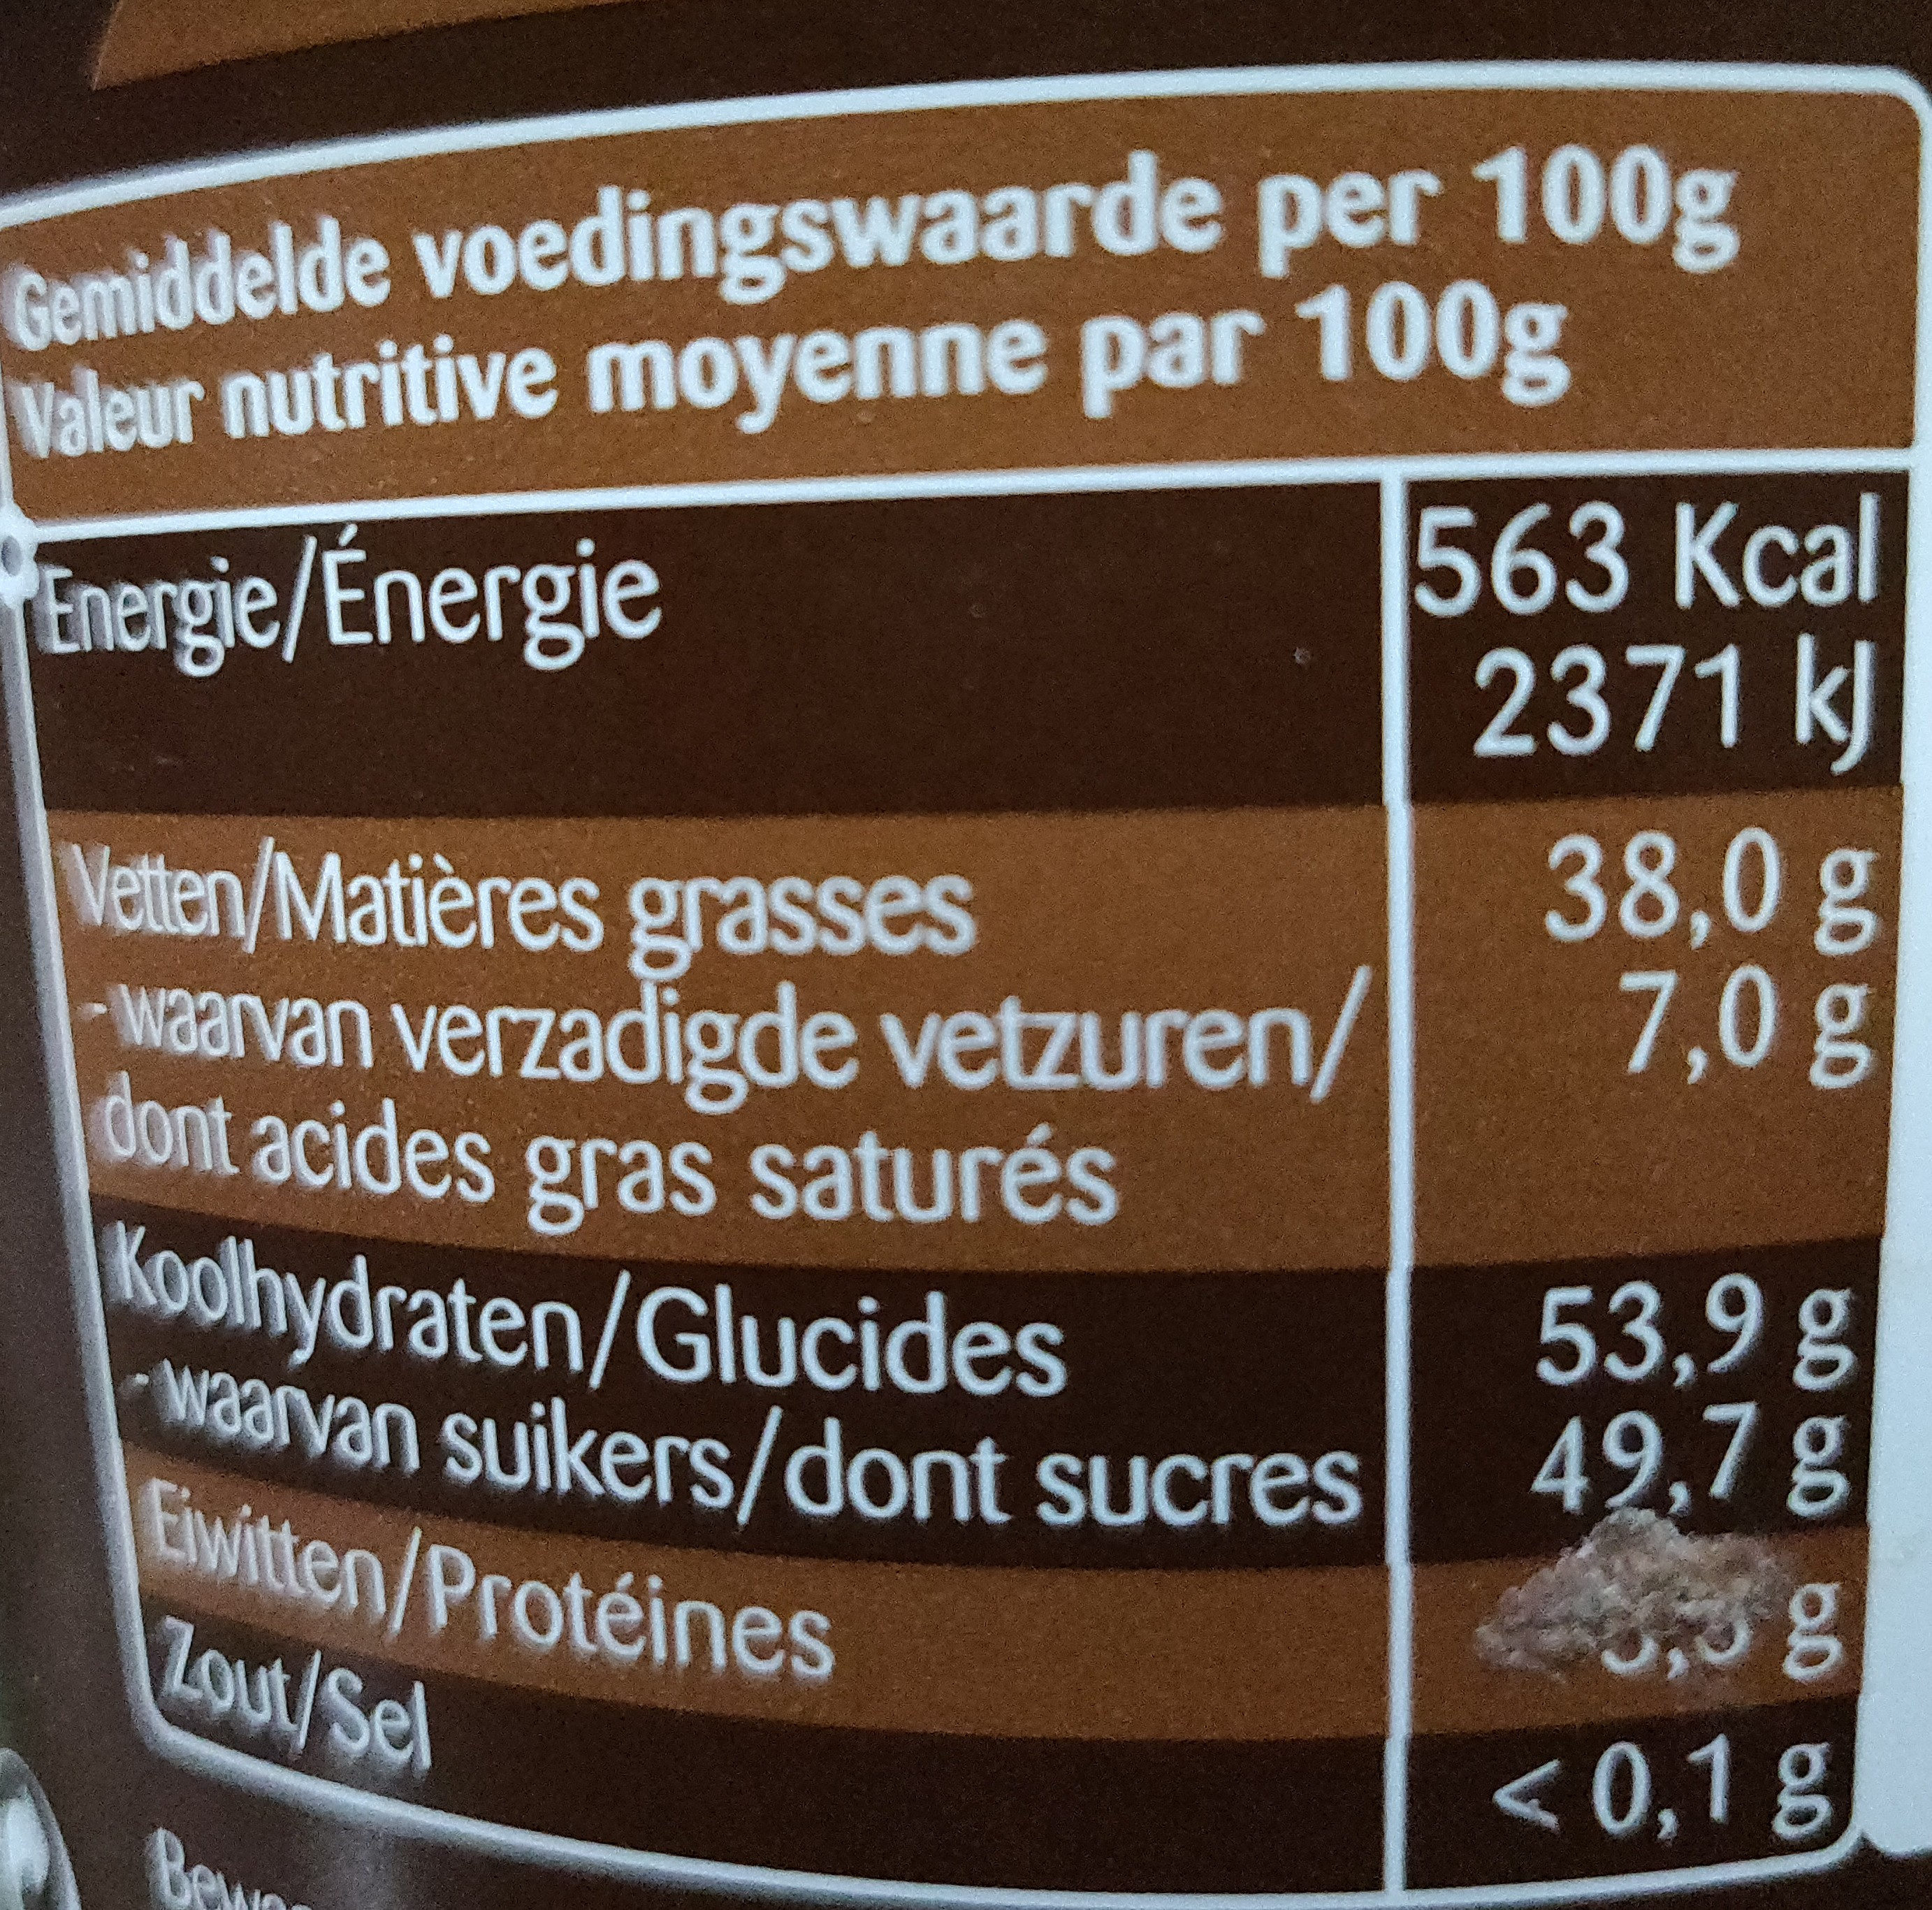 Chocopasta hazelnoten Boerinneke 400G - Informations nutritionnelles - fr